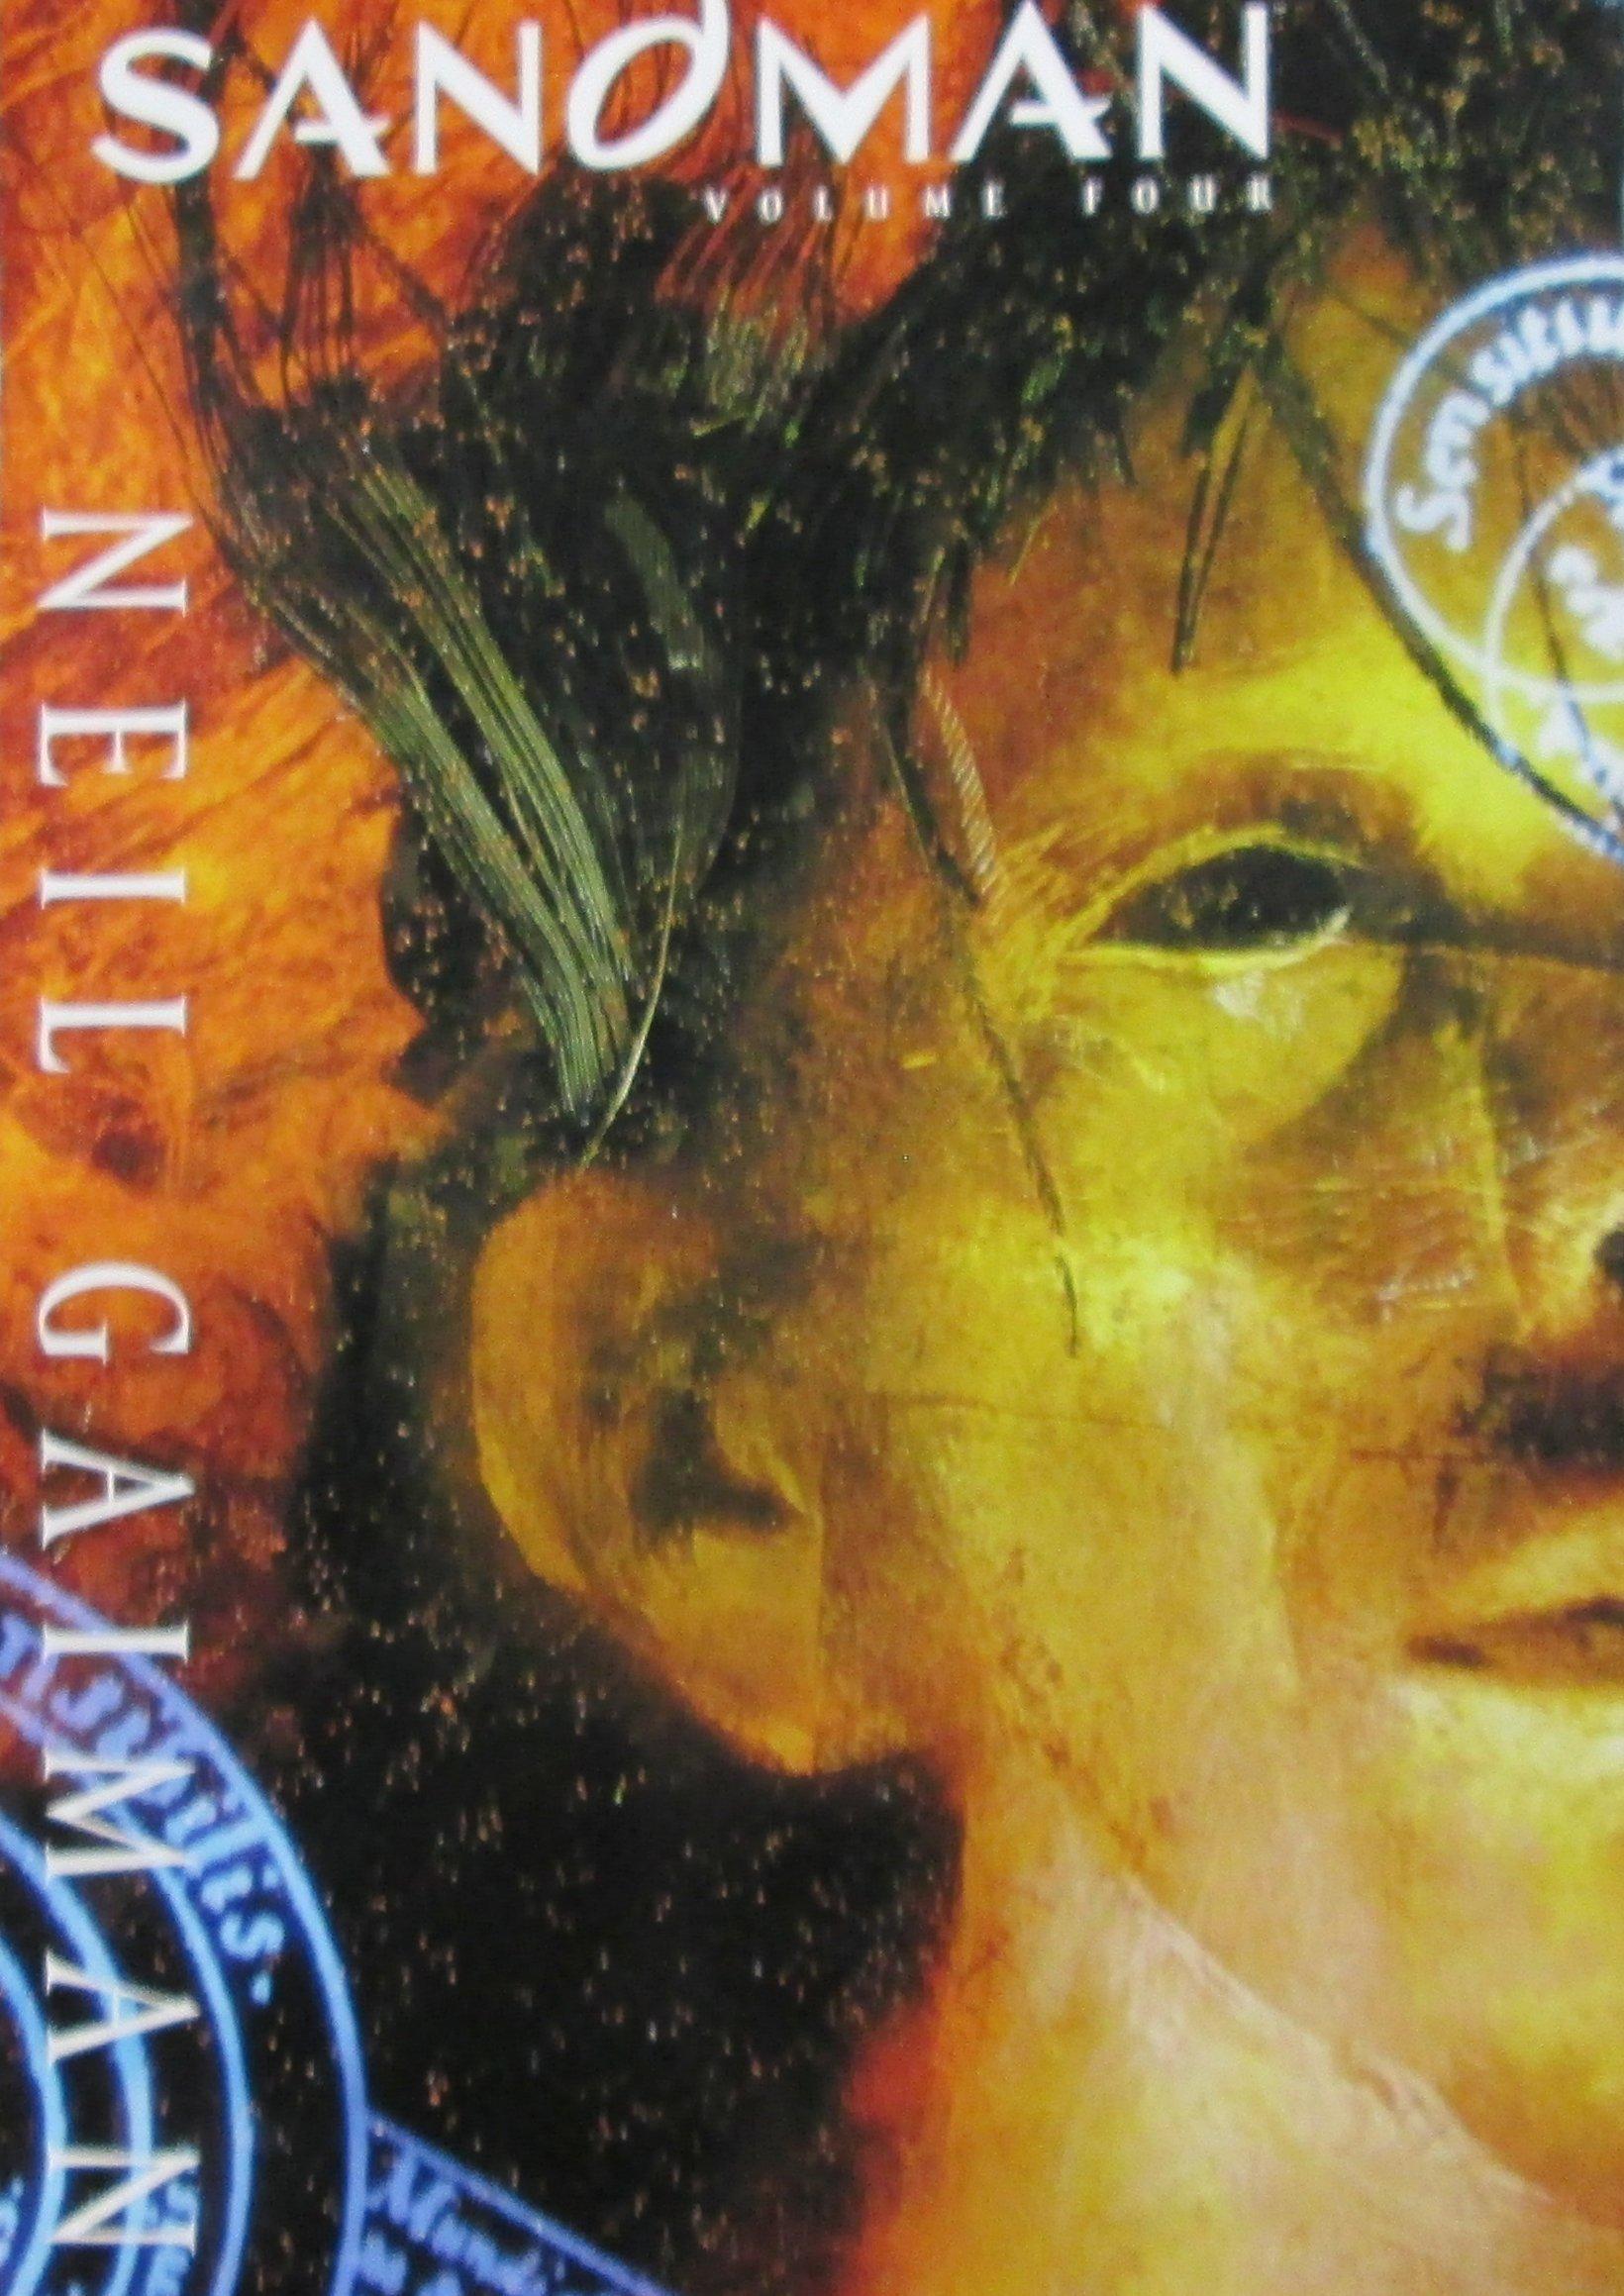 Read The Absolute Sandman Volume Four By Neil Gaiman